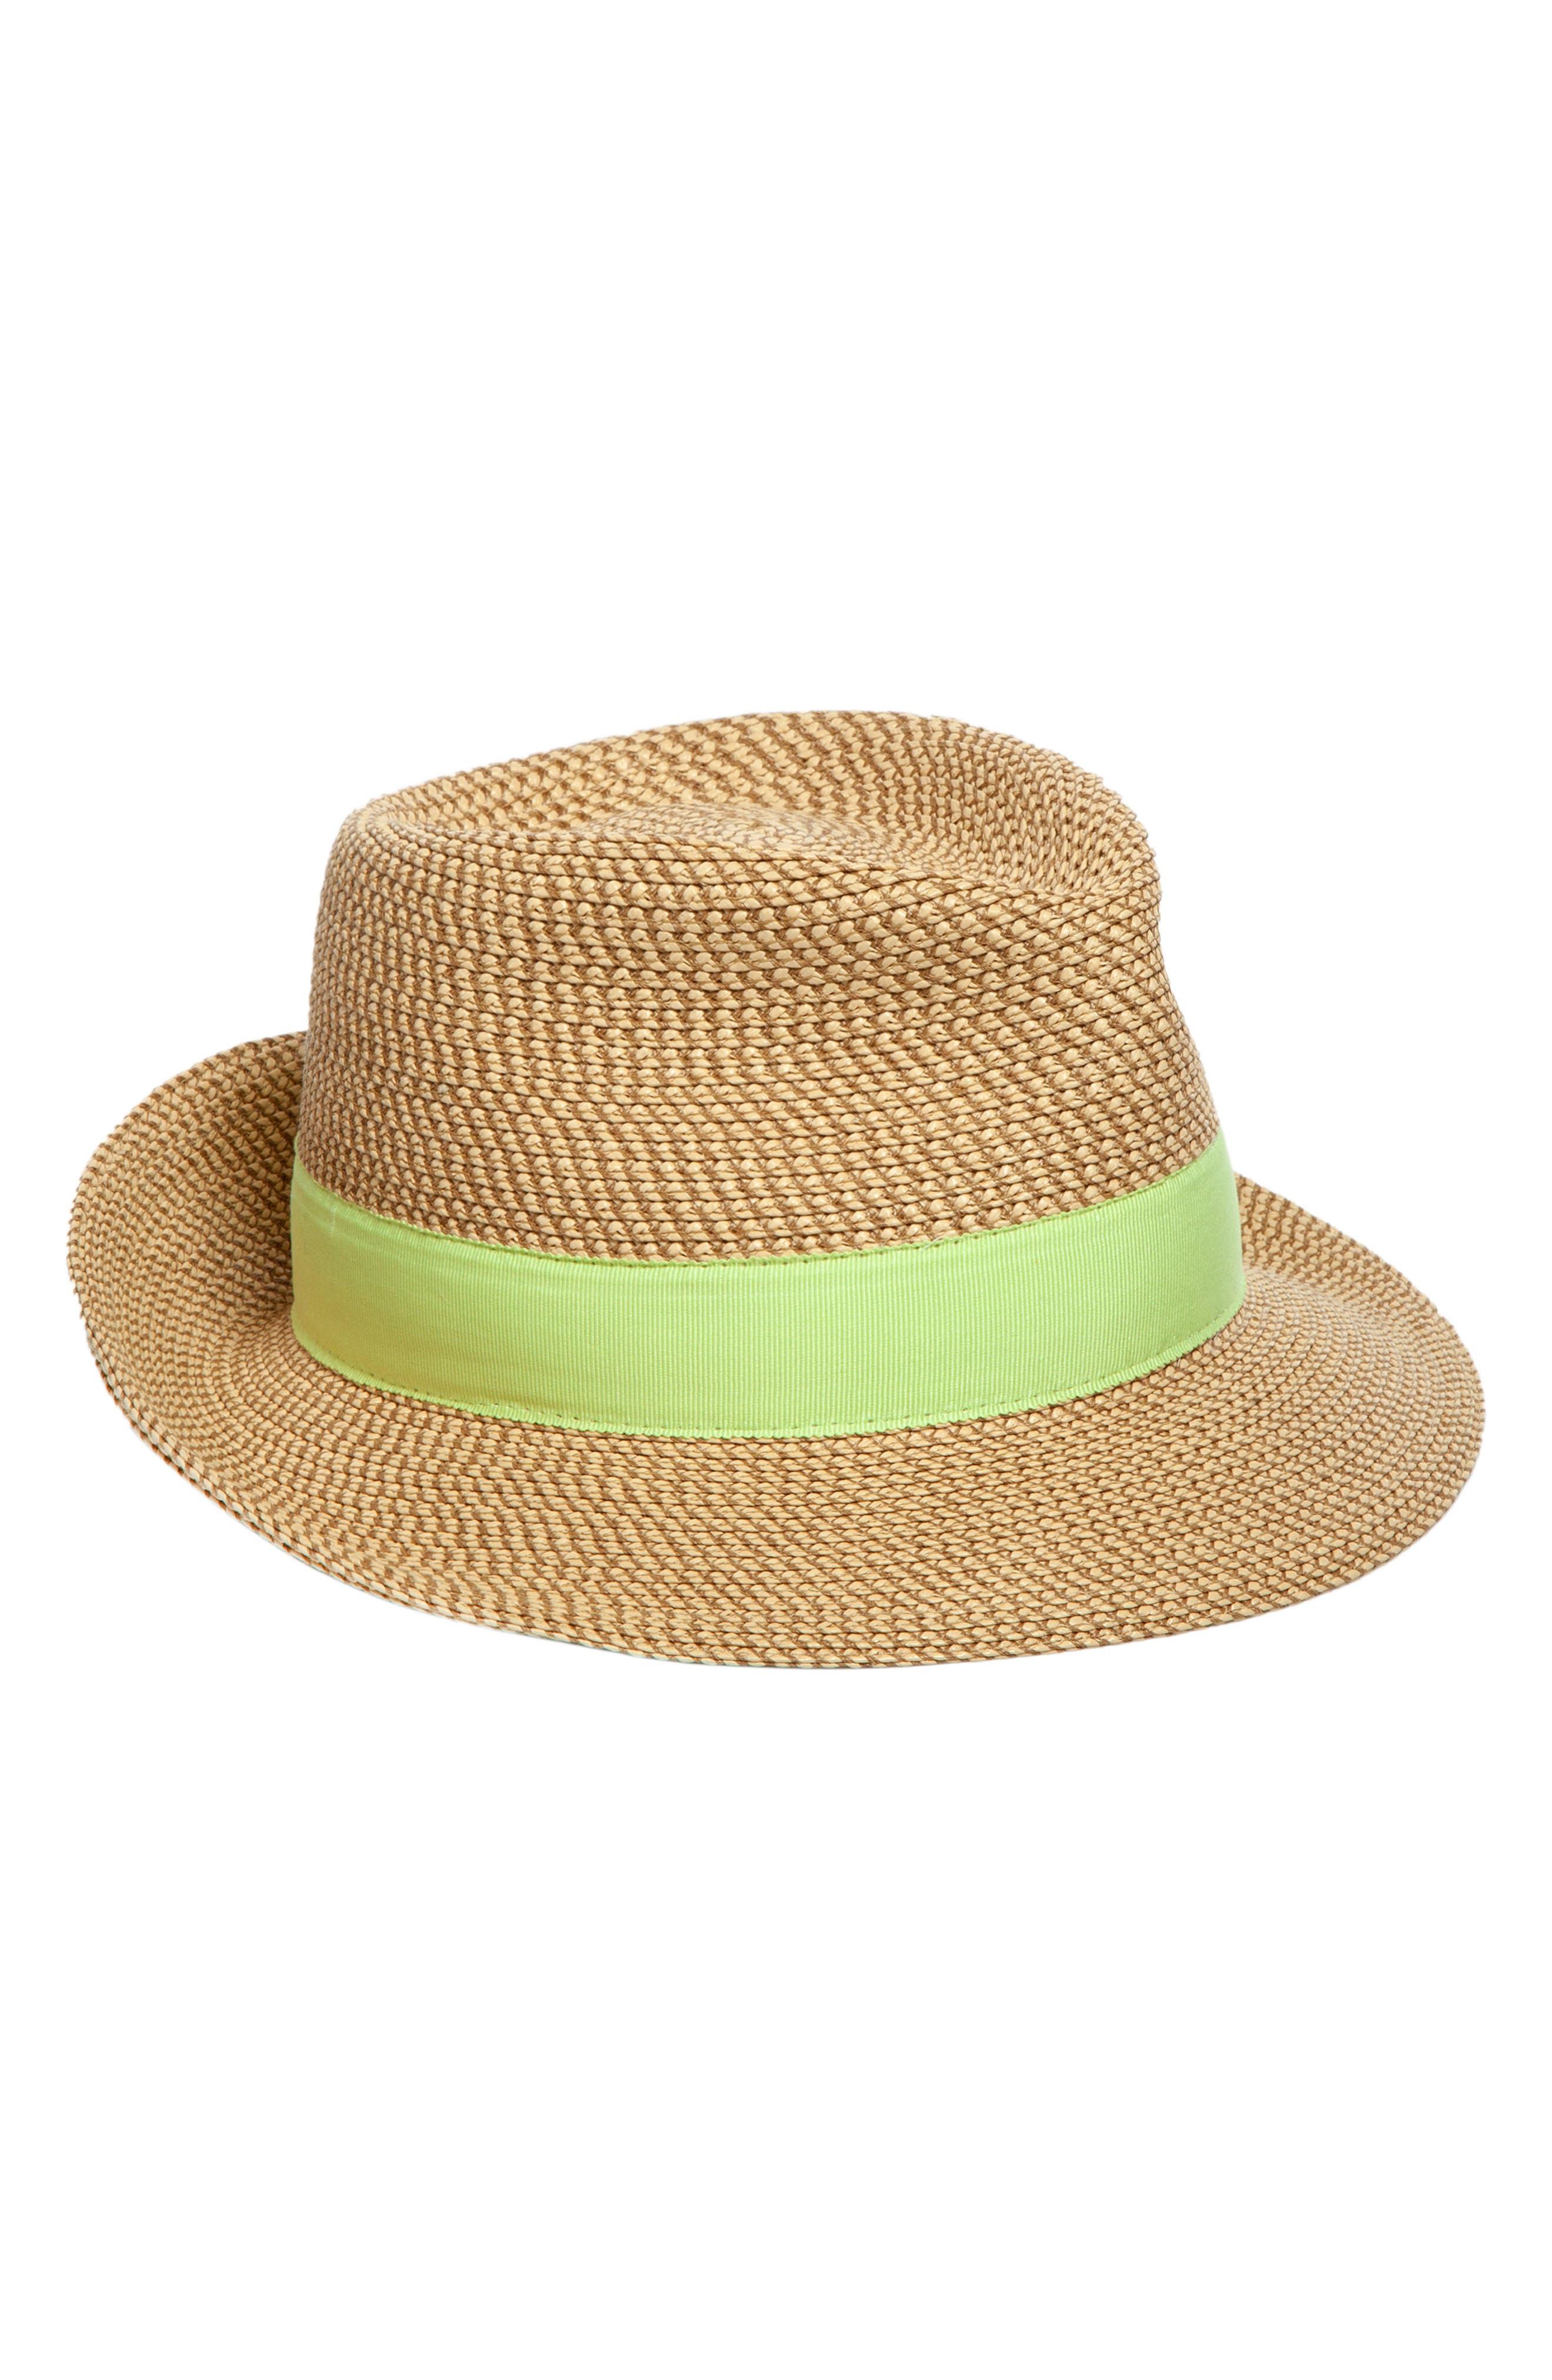 Classic Squishee<sup>®</sup> Packable Fedora Sun Hat,                             Main thumbnail 1, color,                             PEANUT/ CITRON